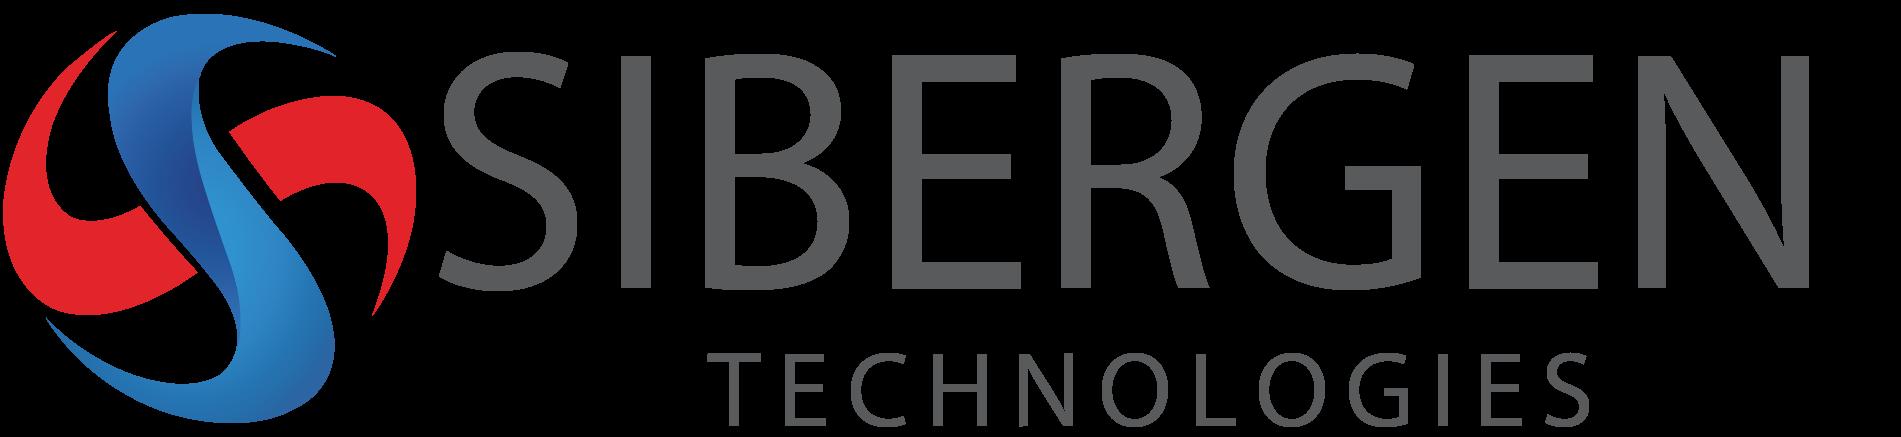 SIBERGEN Technologies Logo